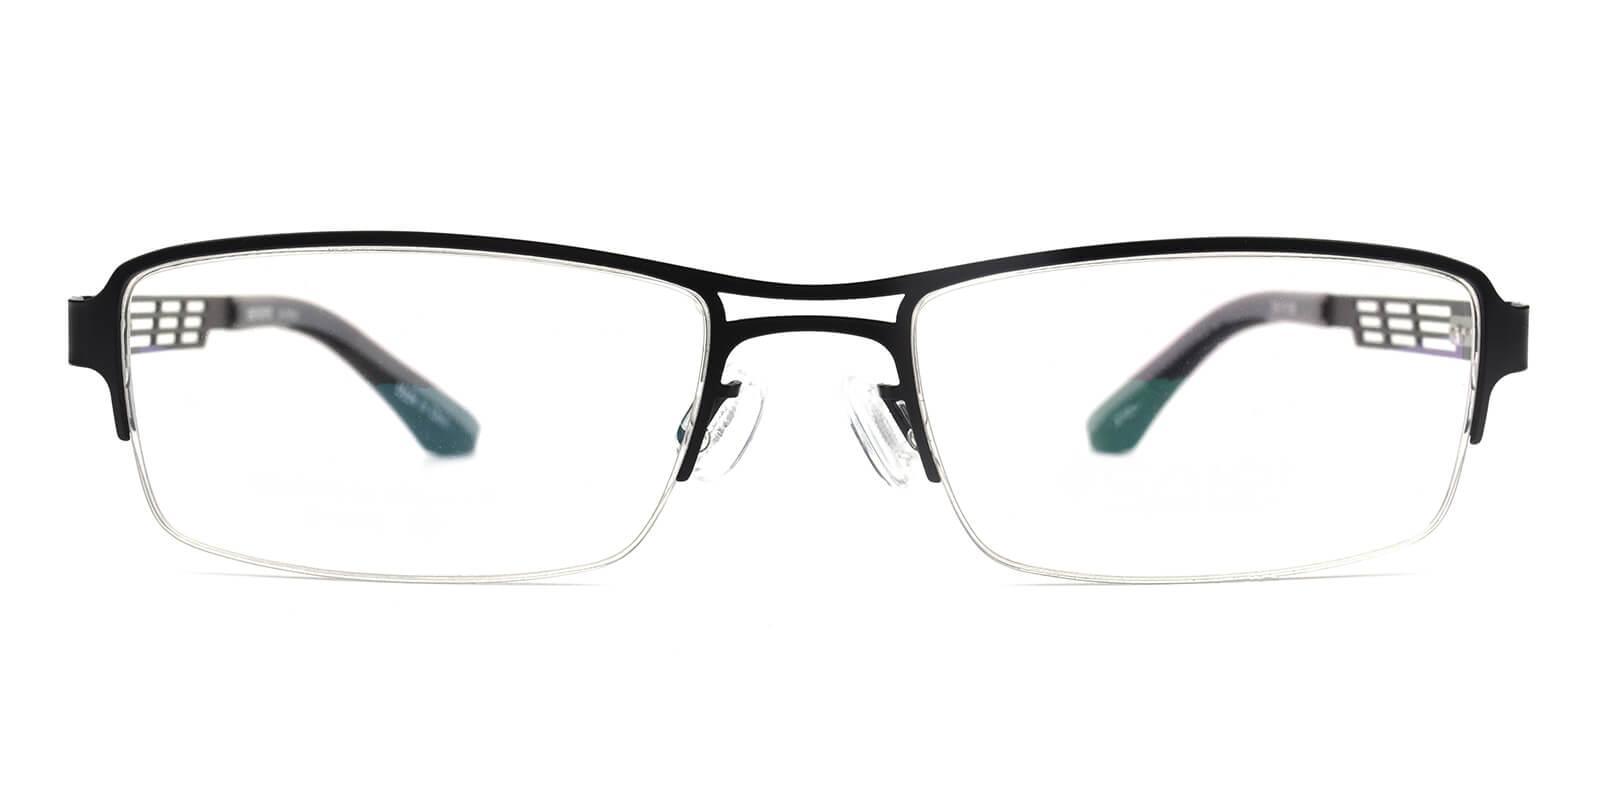 Carel-Gray-Rectangle-Metal-Eyeglasses-additional2